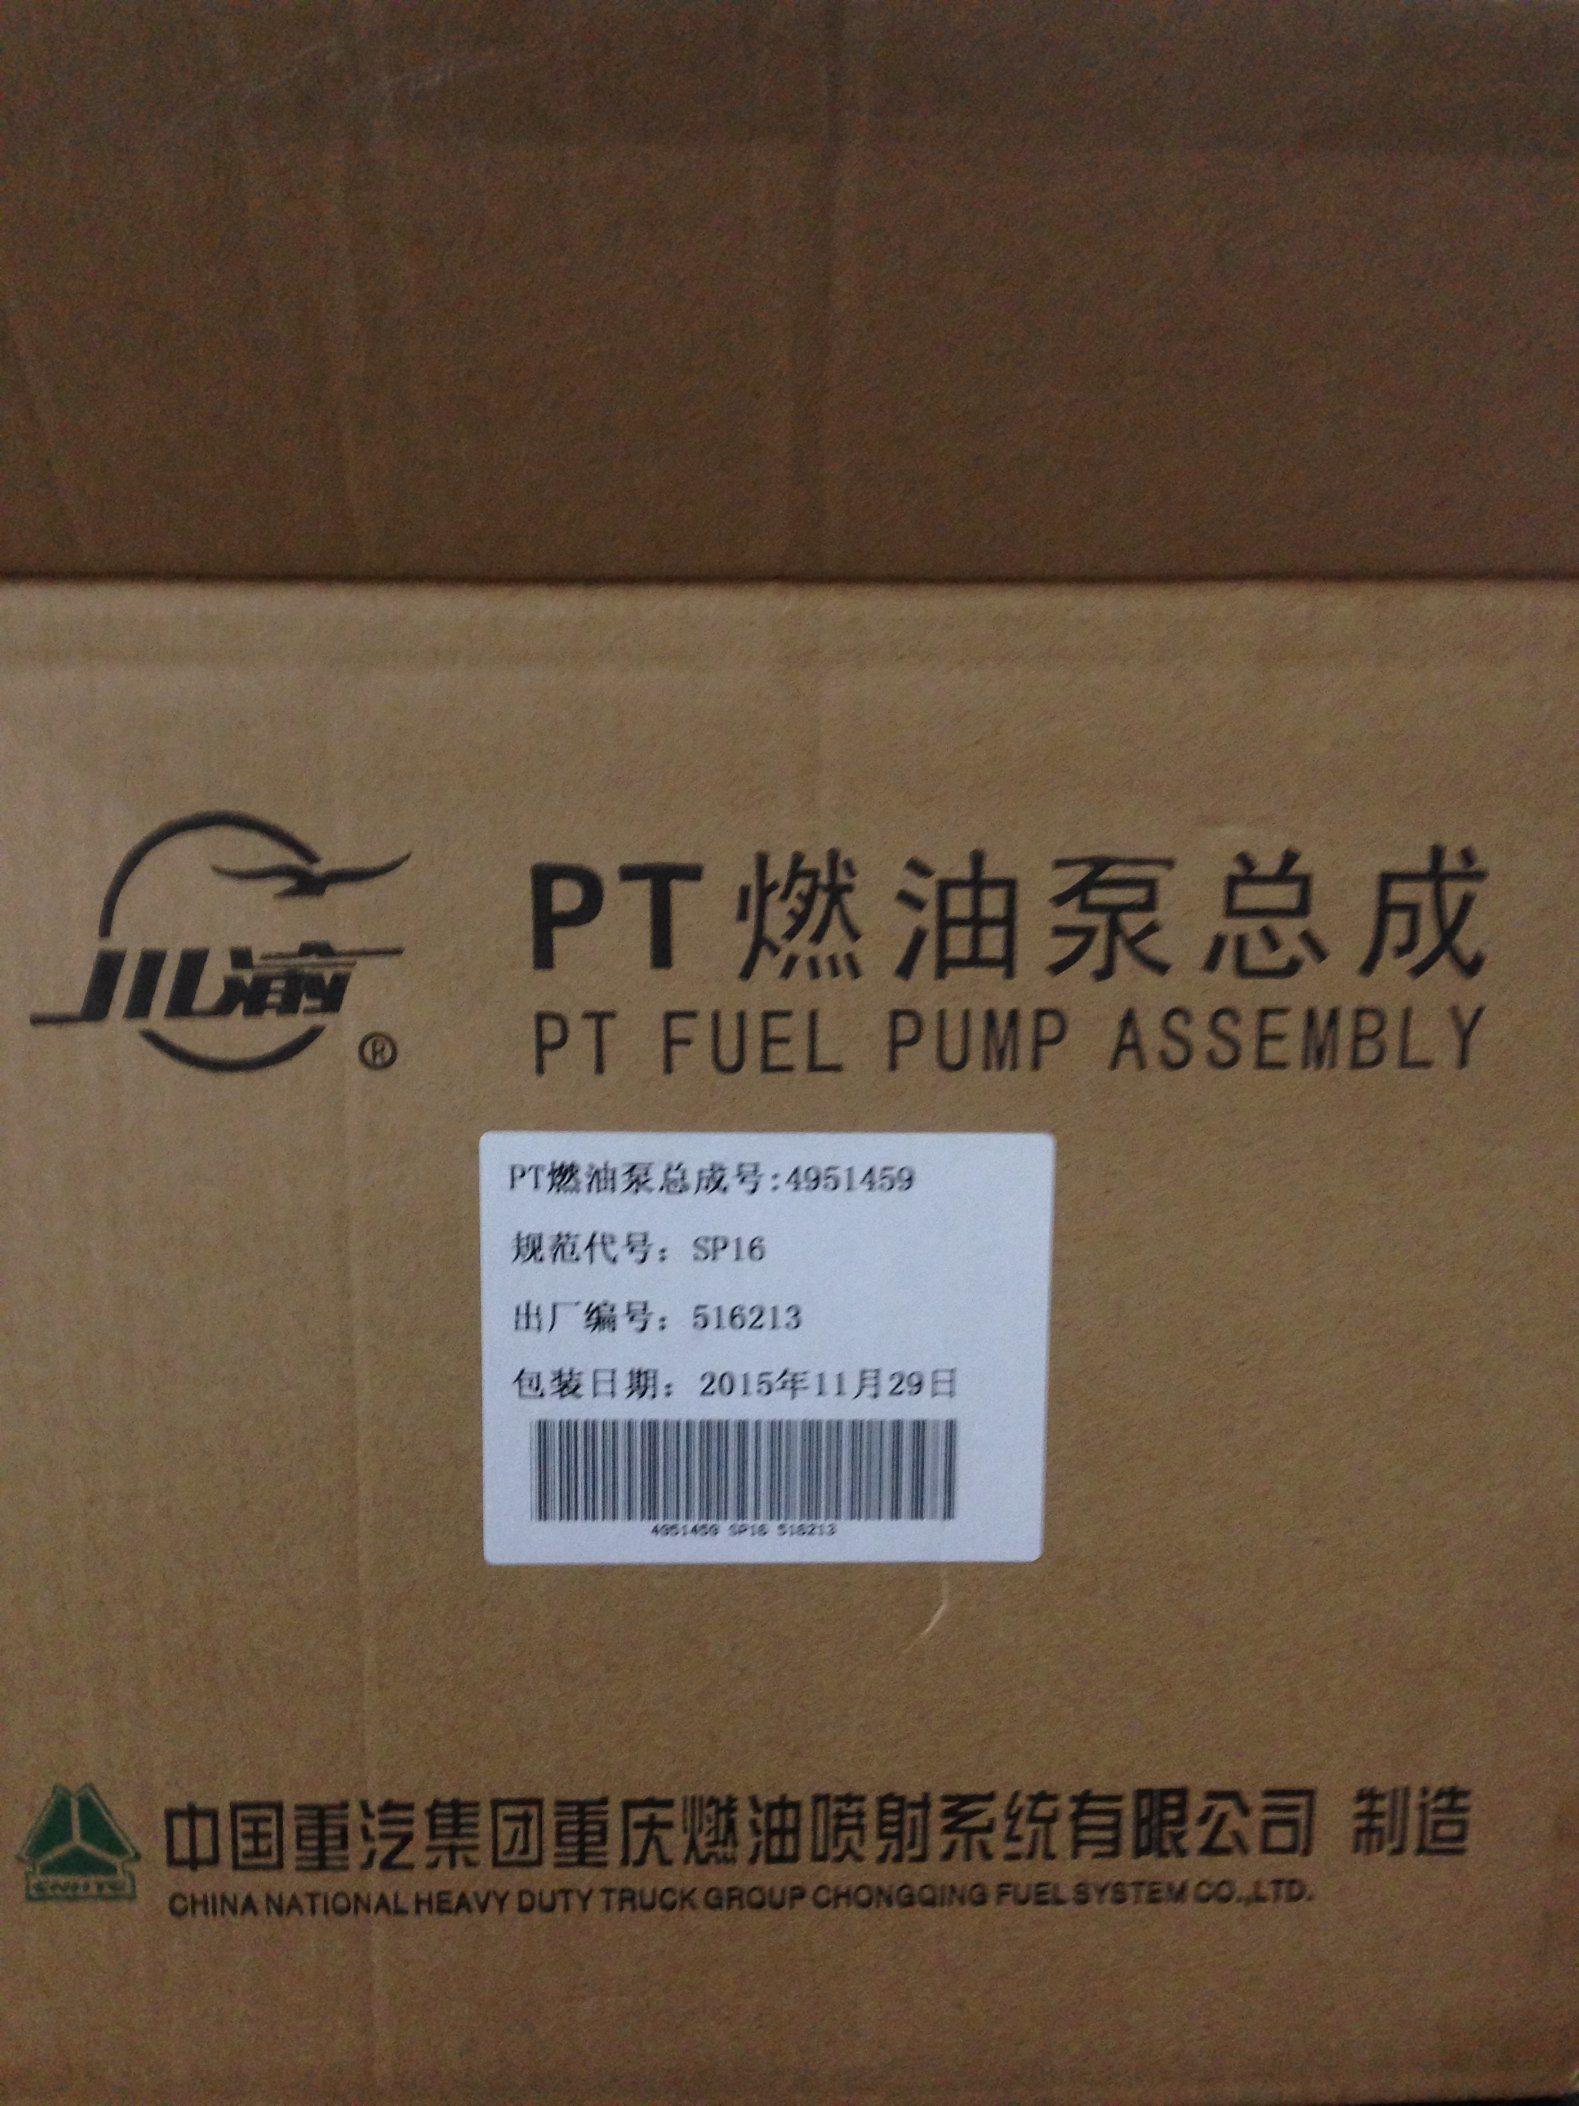 Cummins Excavator Parts Nt855 PT Fuel Pump 4951459 3059651